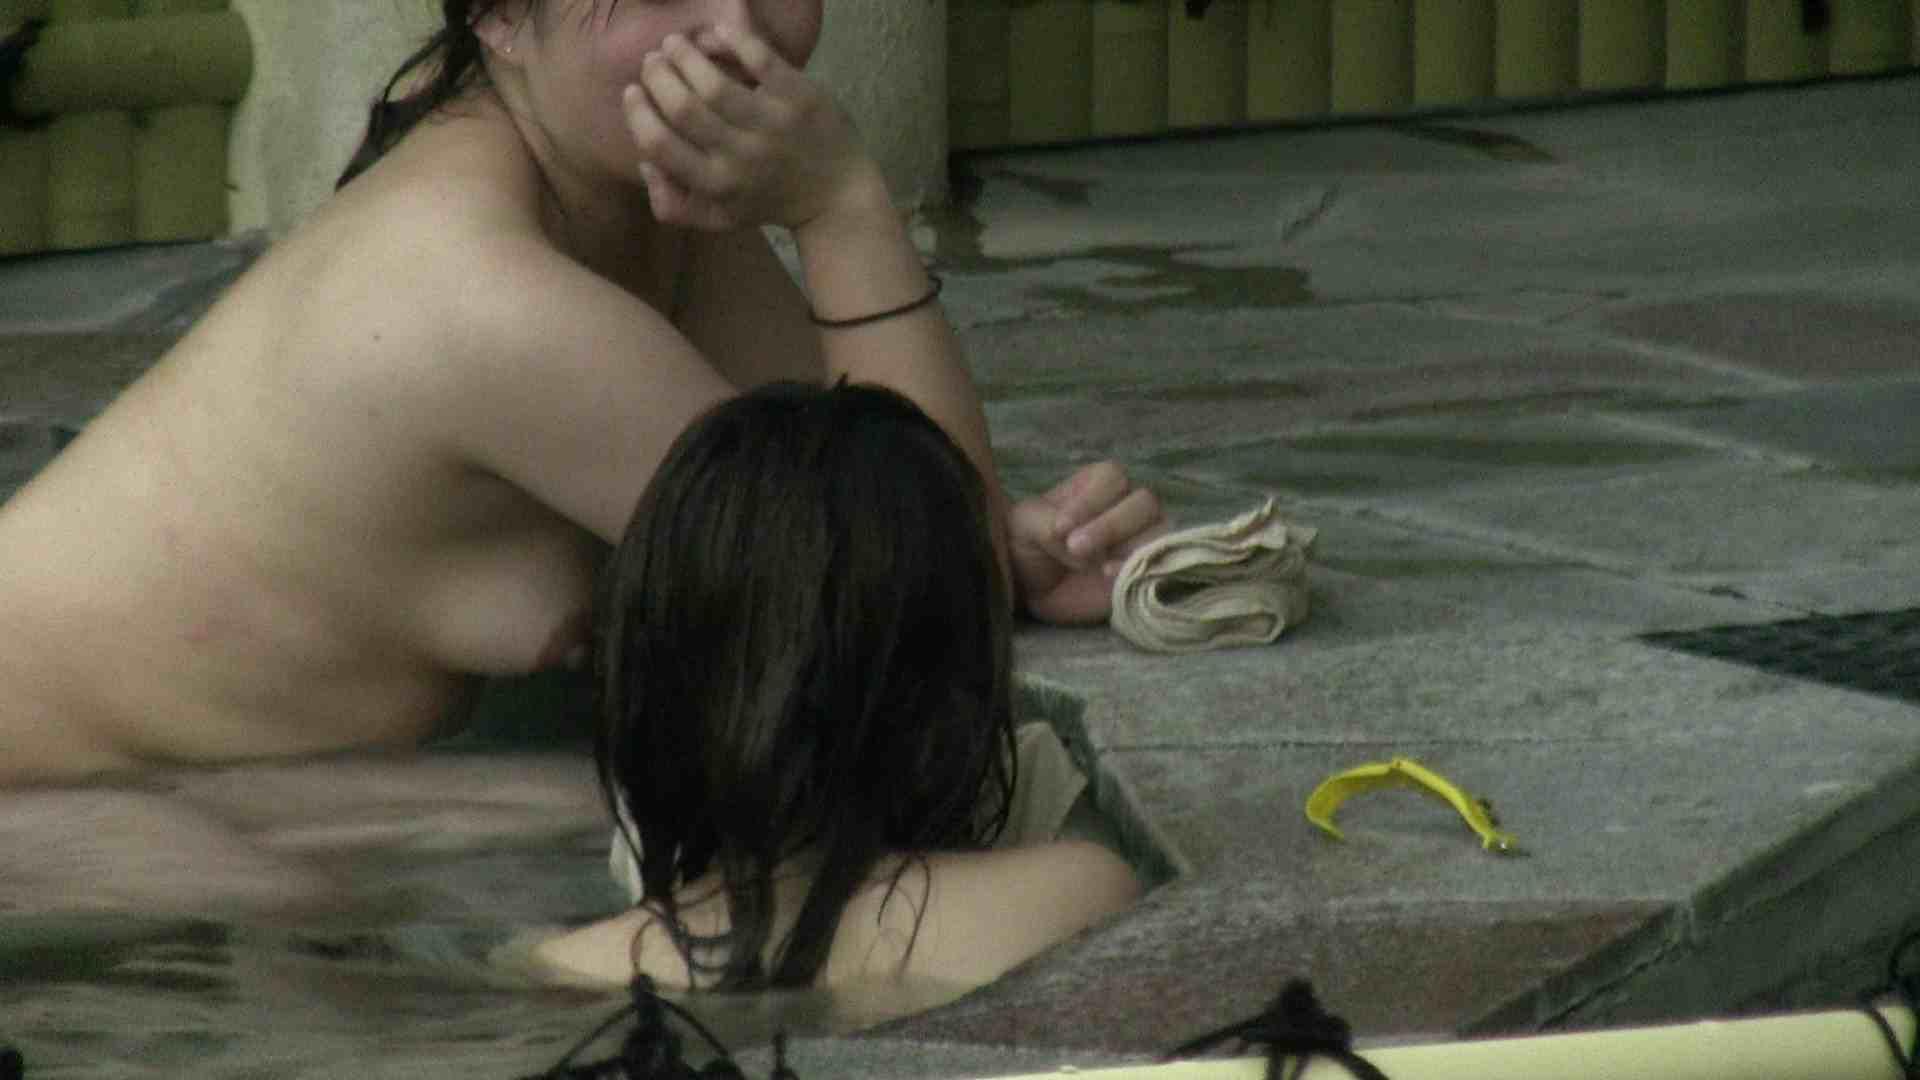 Aquaな露天風呂Vol.184 露天 | 盗撮特撮  13pic 4